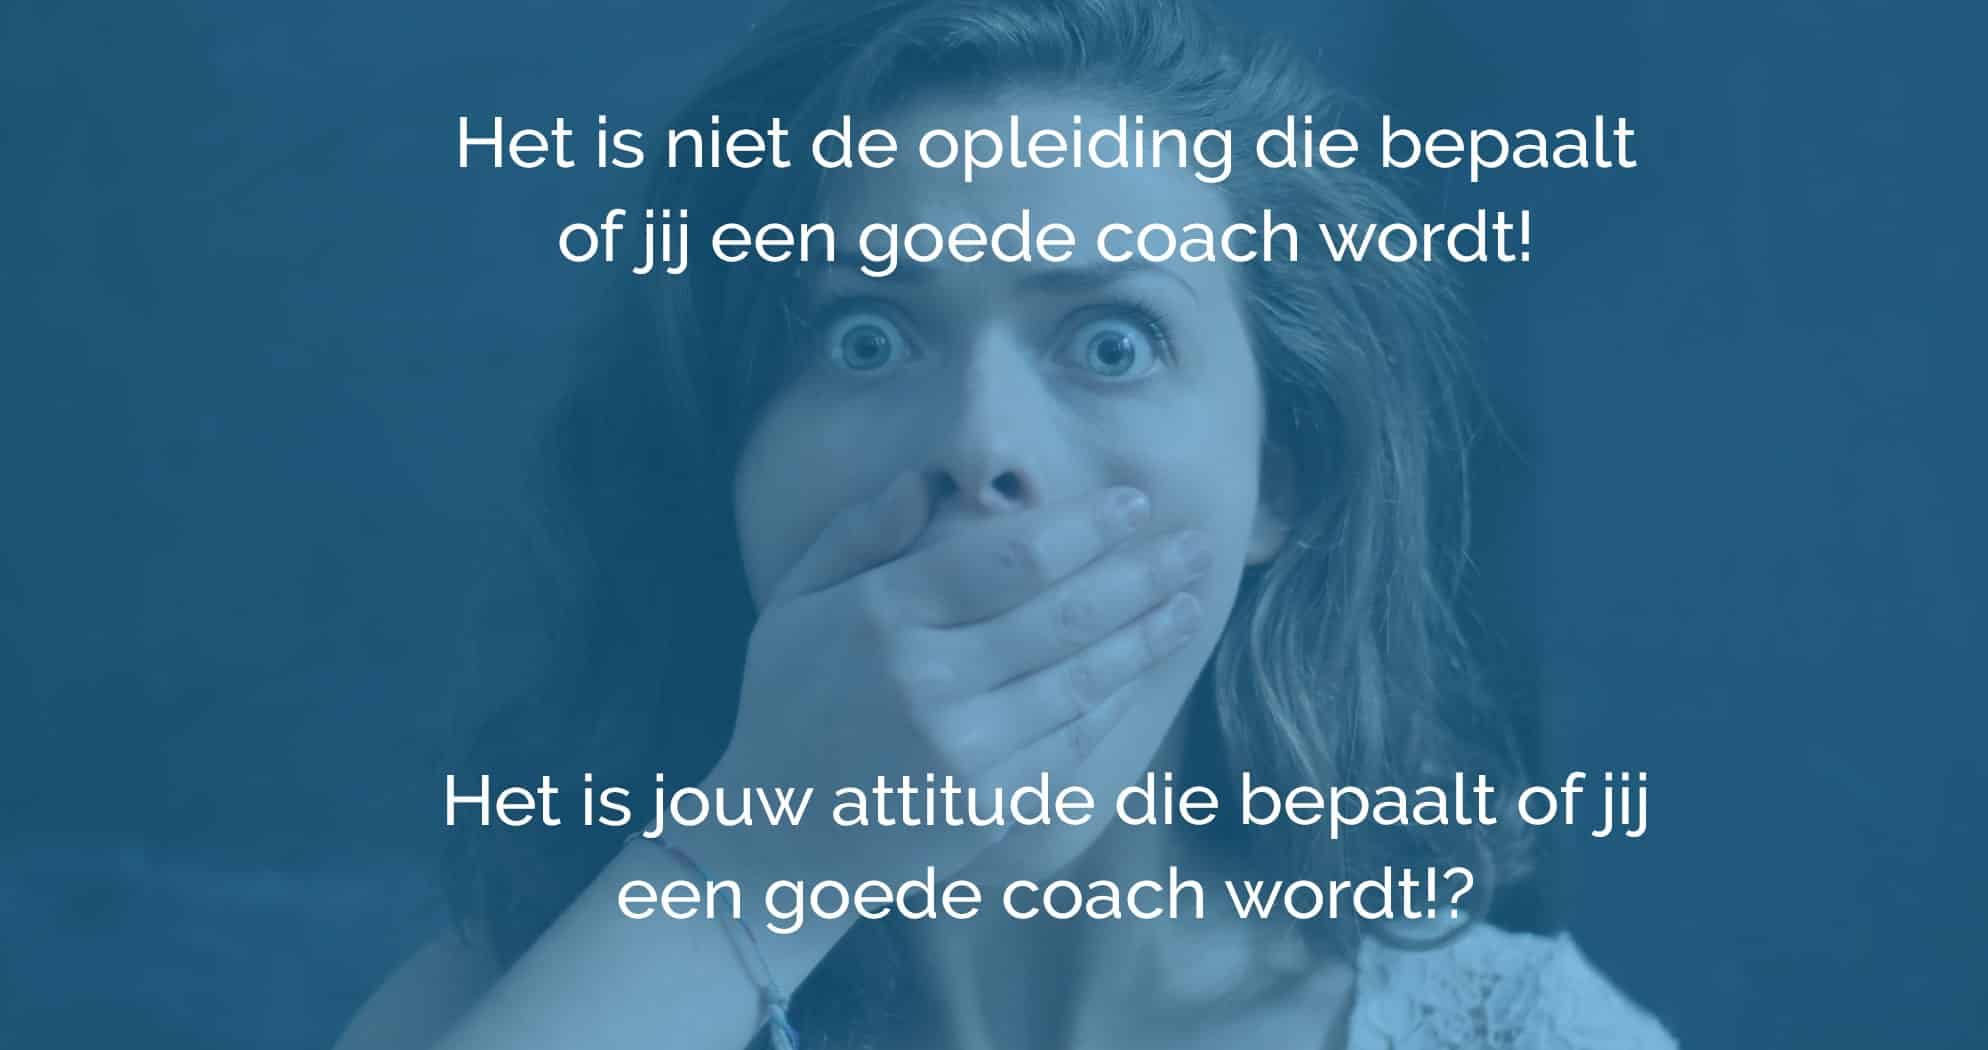 Hoe Kies Ik De Juiste Coaching Opleiding | Apluscoaching | Anja Pairoux